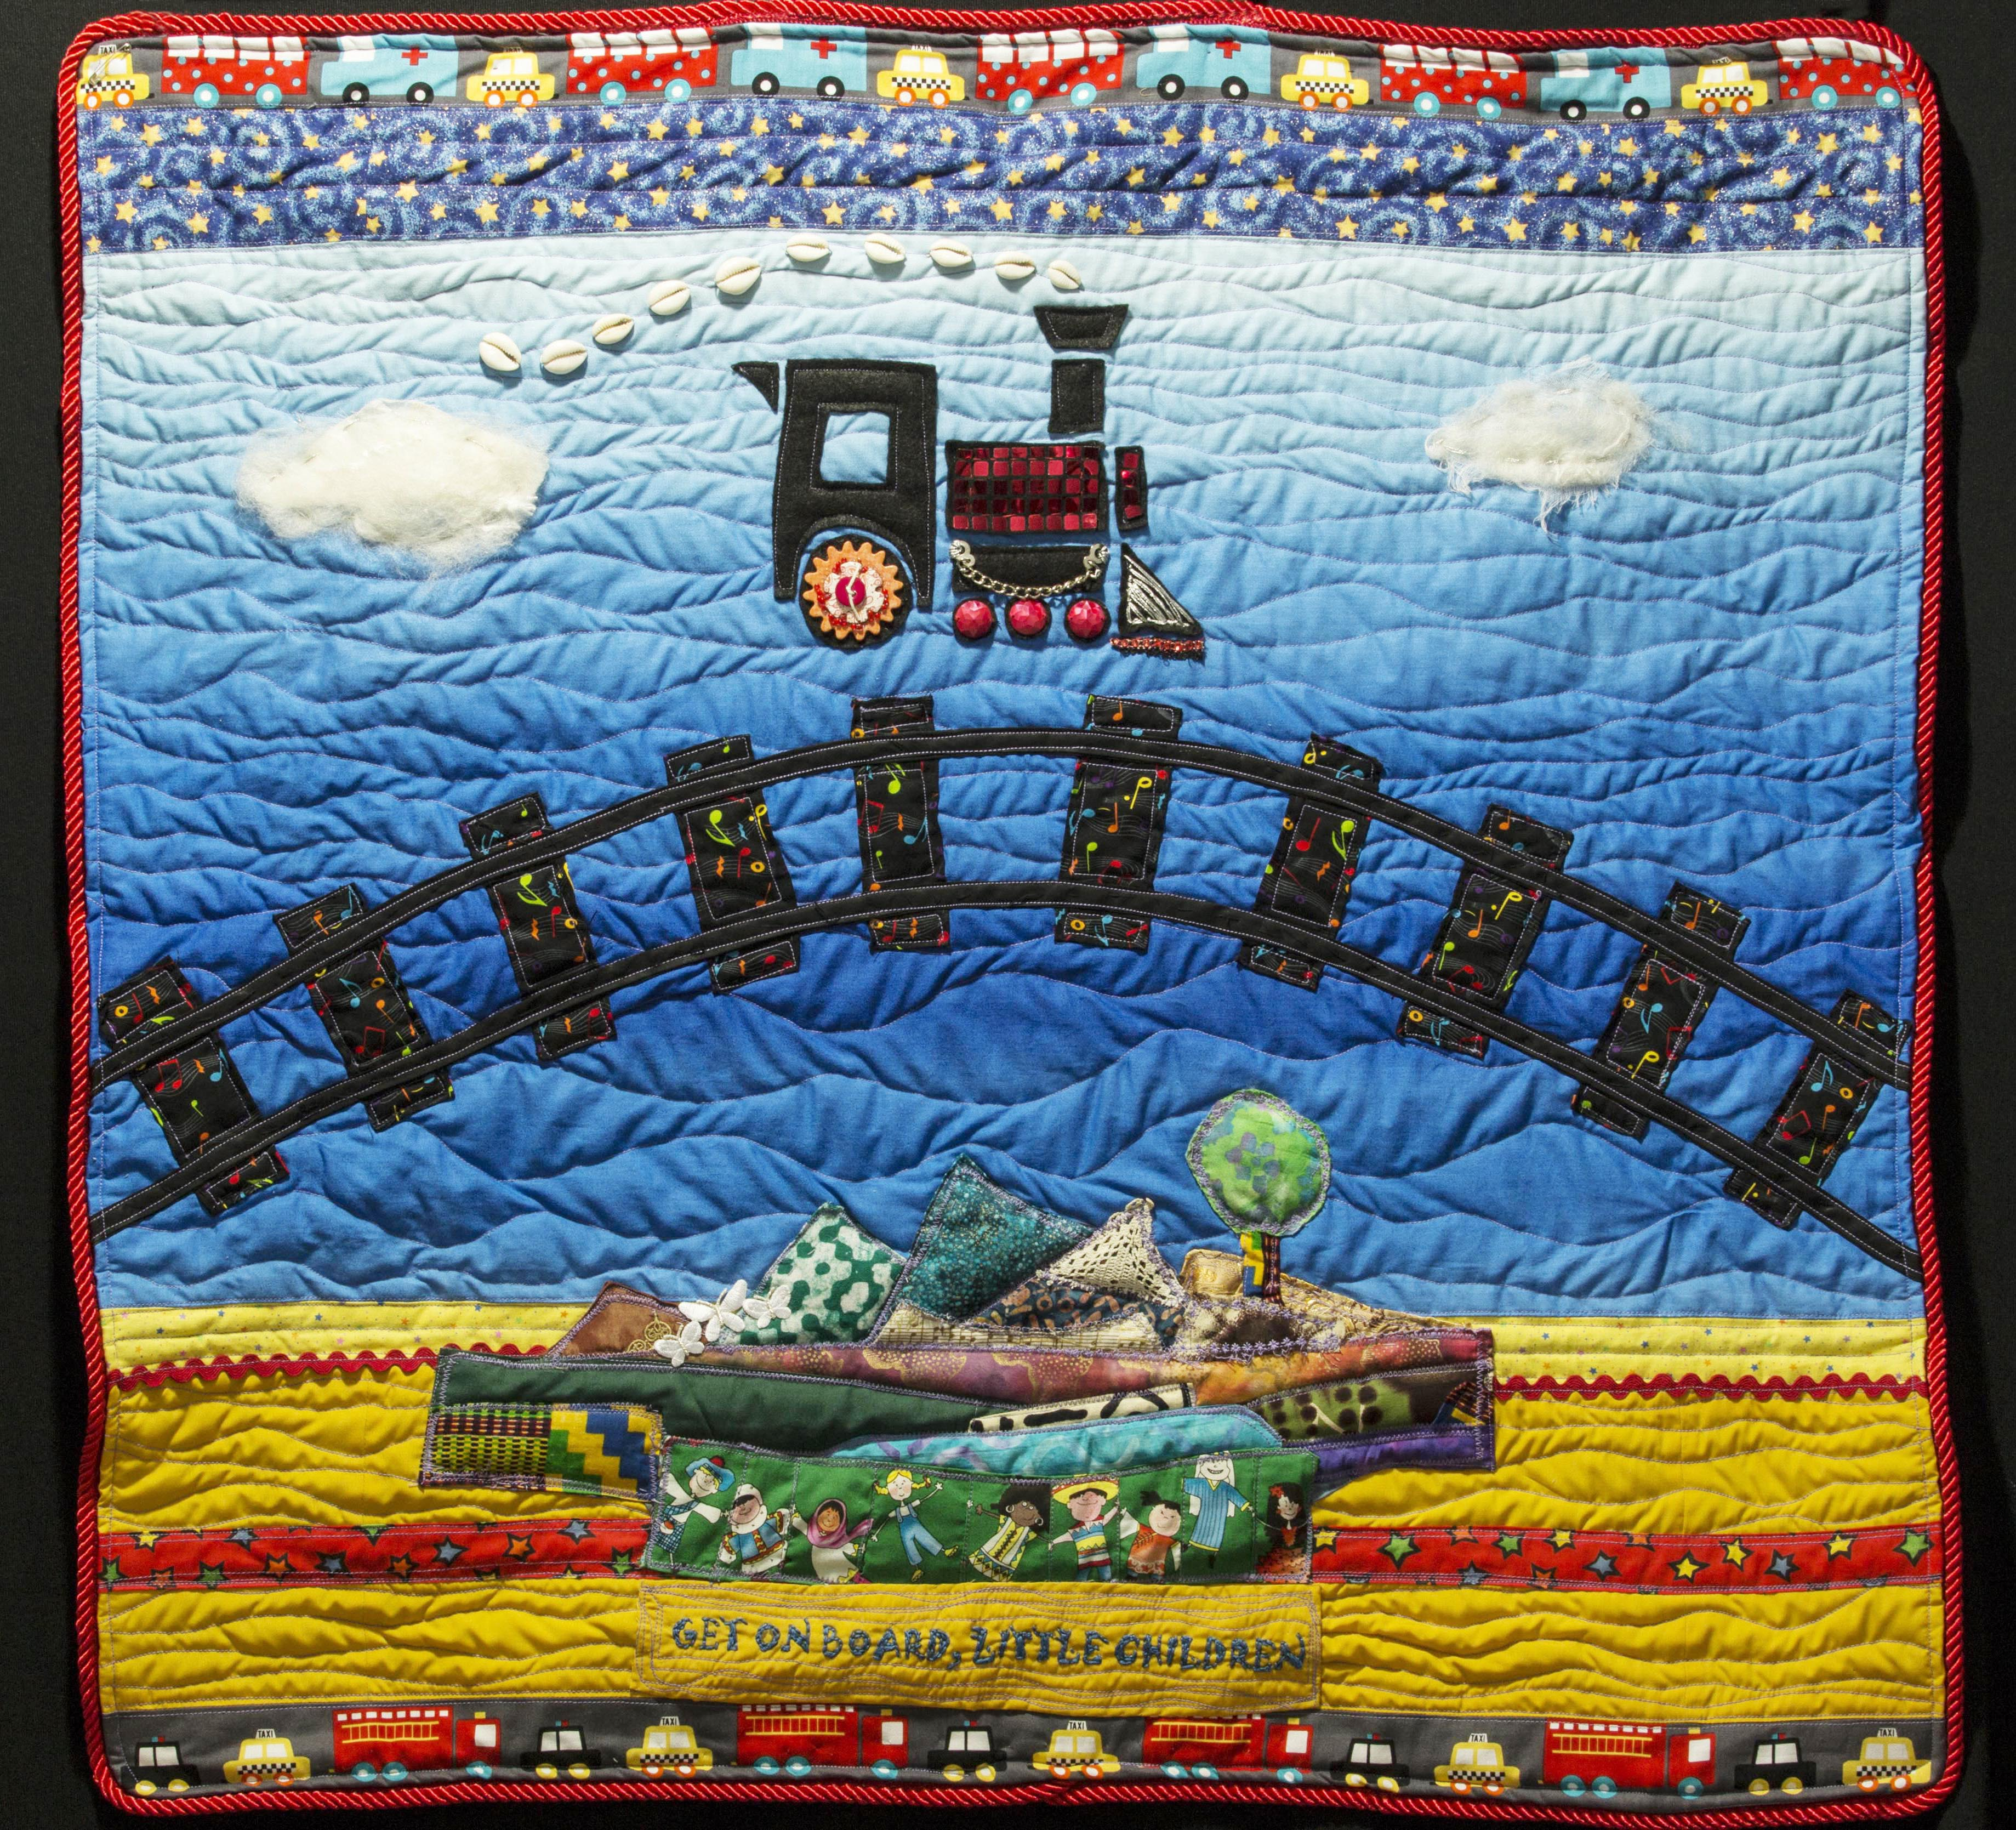 Vernacular - Quilts